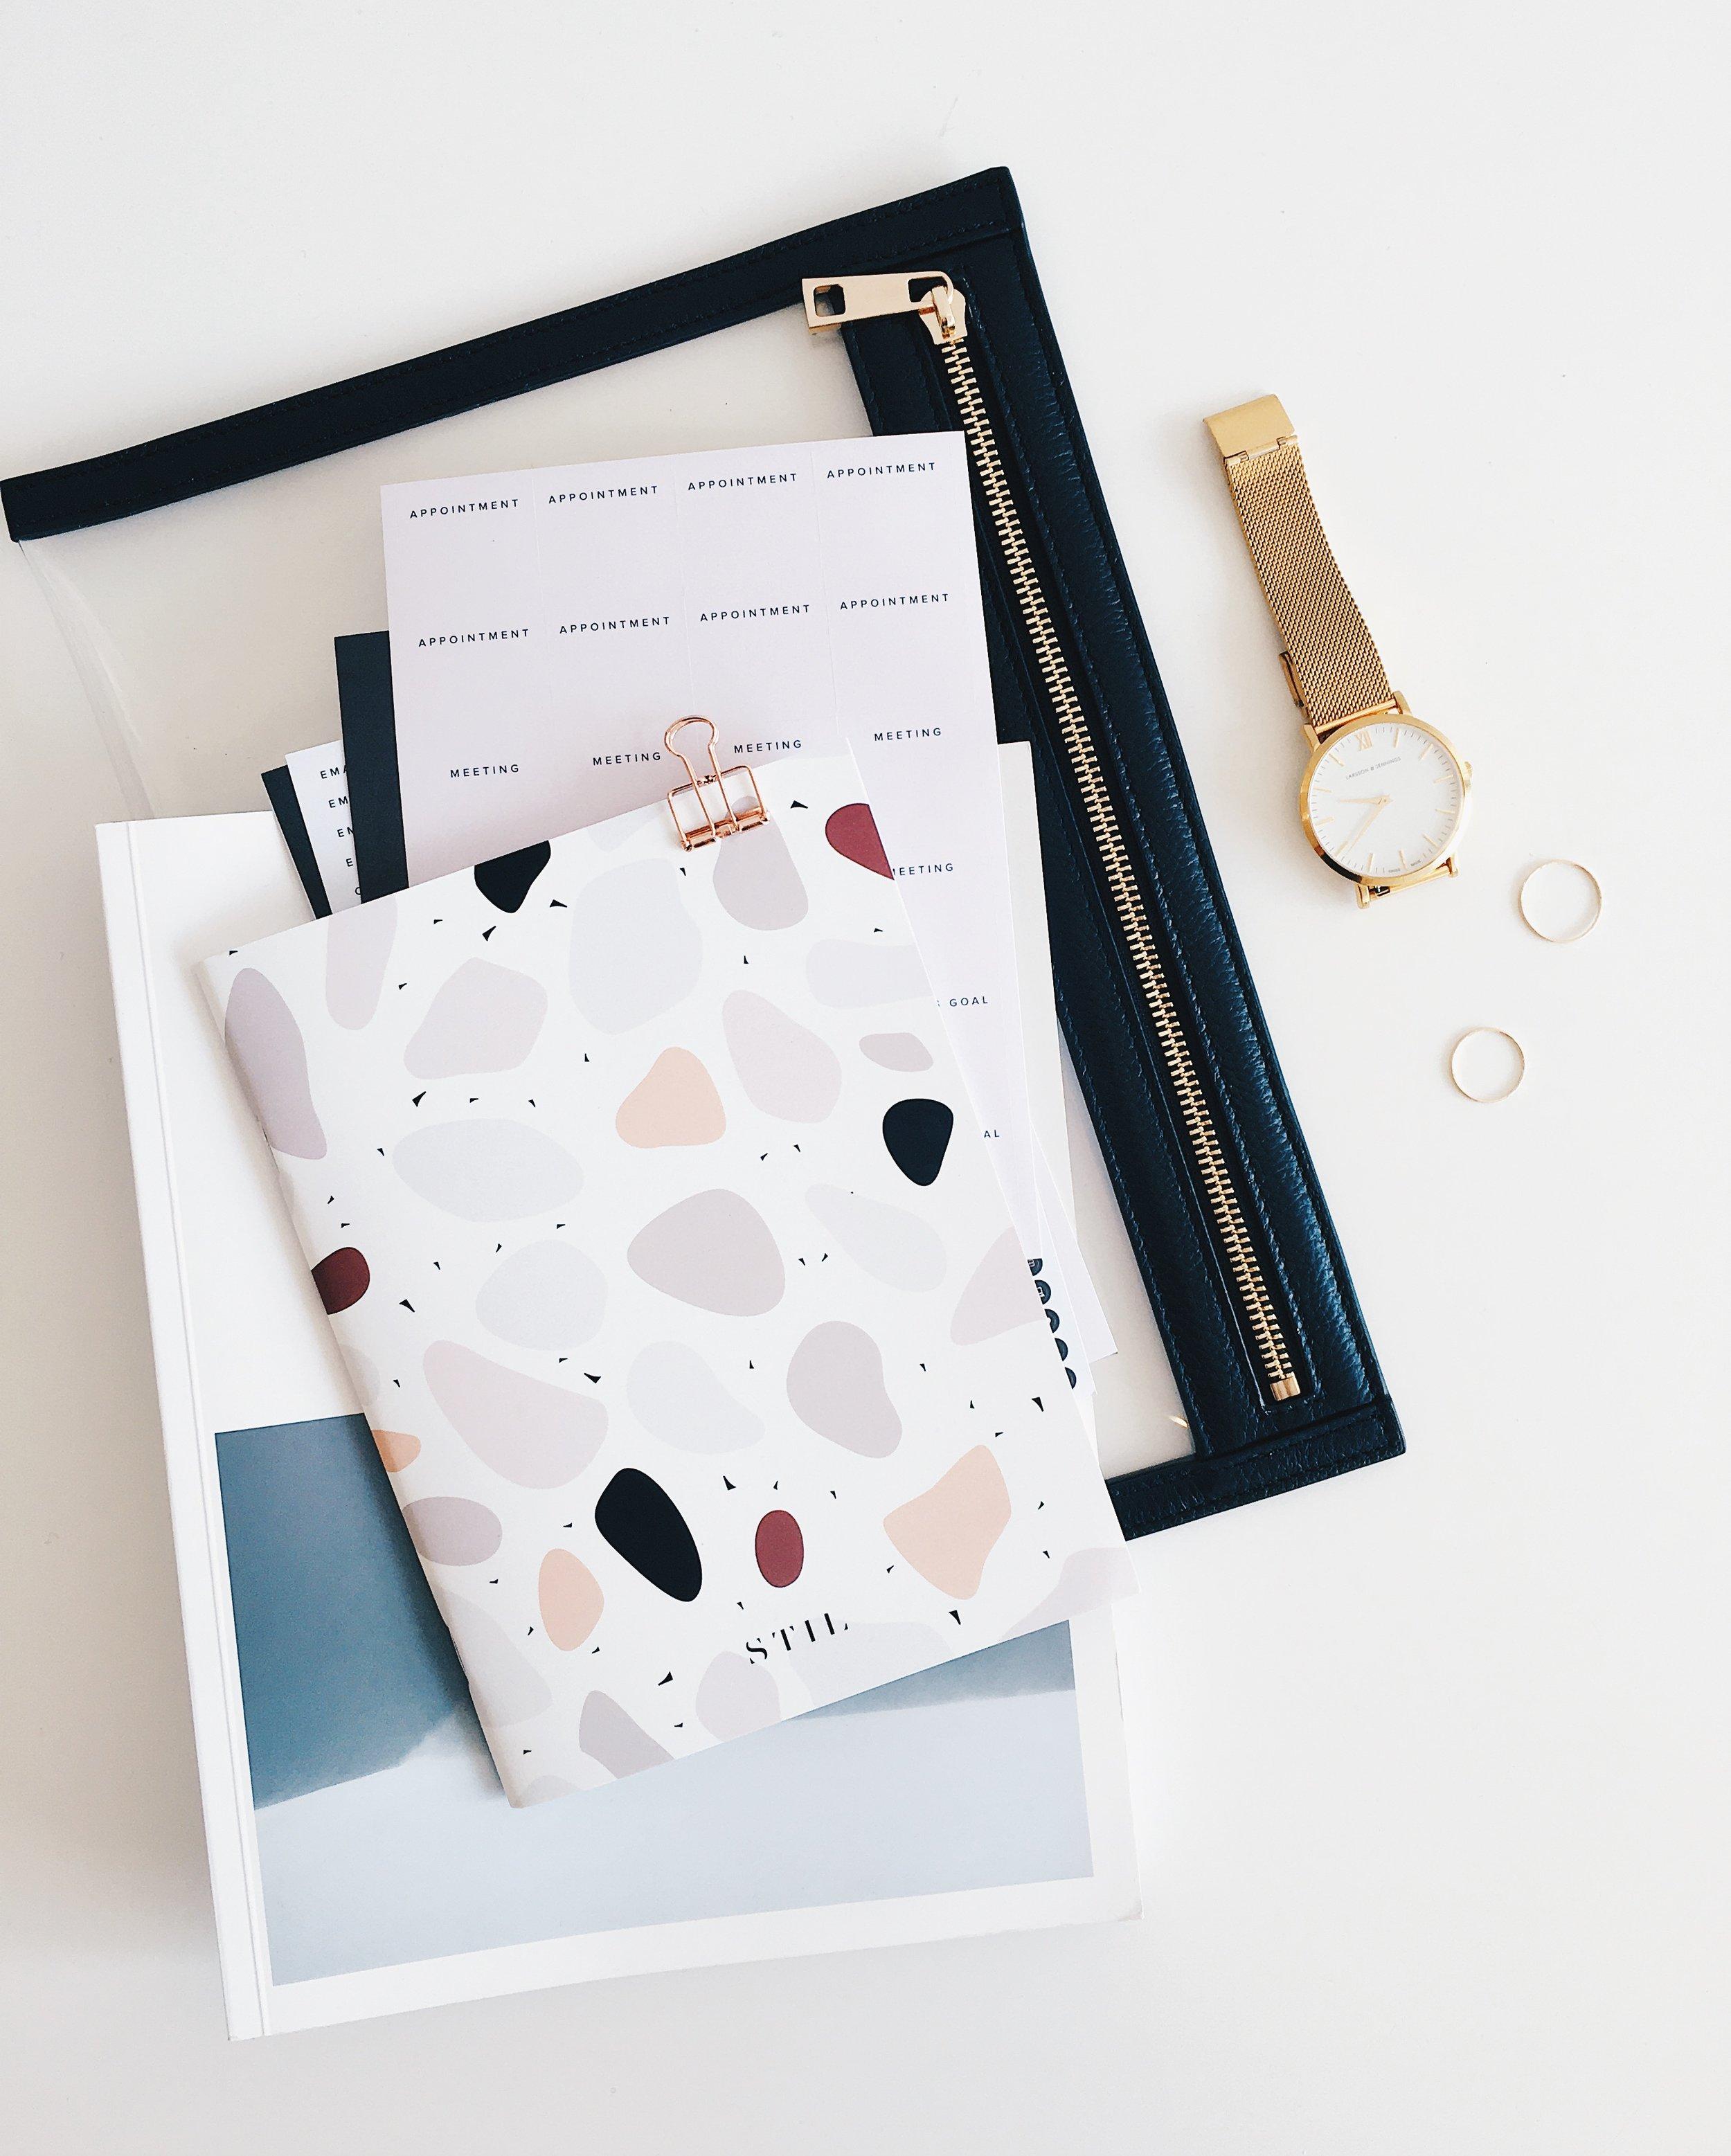 creative lifestyle and productivity blog | tawnimarie.com | notebooks, gold watch, organization